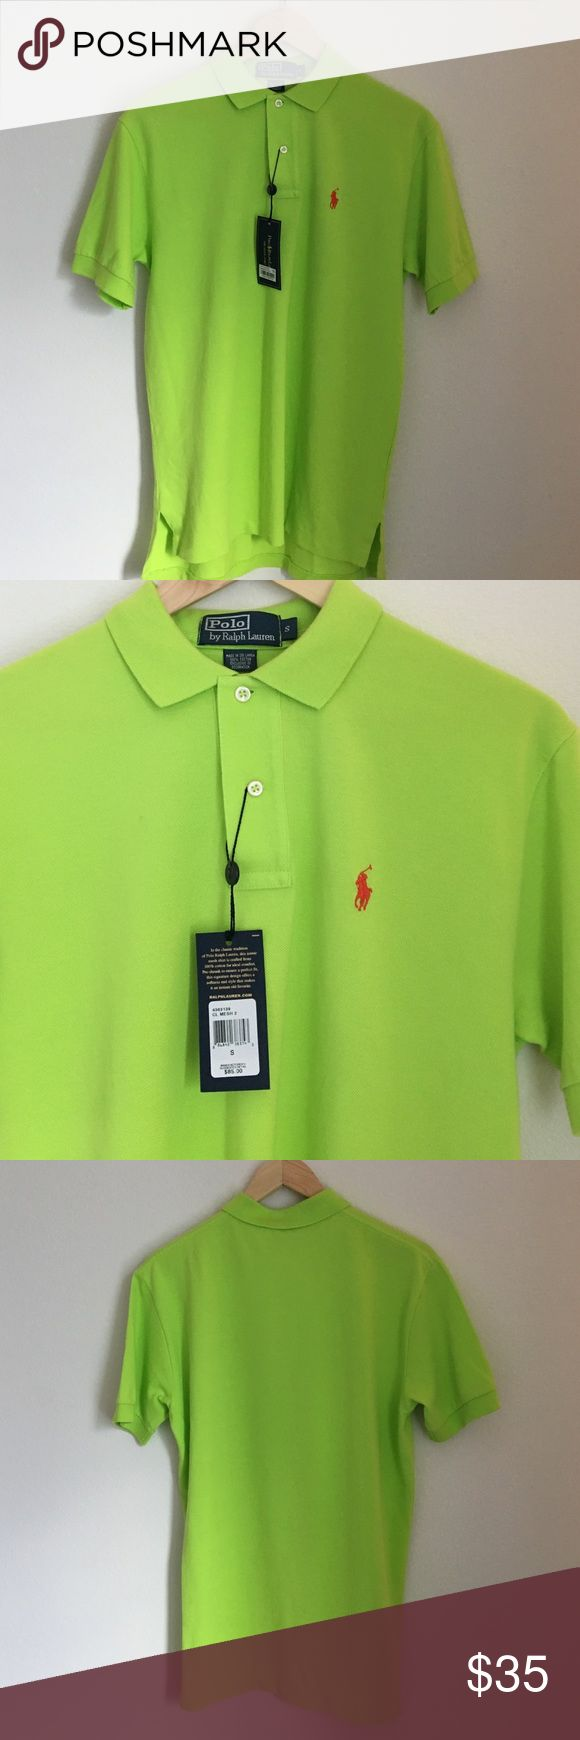 Polo by Ralph Lauren Lime Green Polo Shirt Brand New With Tags. Polo by Ralph Lauren Lime Green Polo Shirt in a Men's Size Small Polo by Ralph Lauren Shirts Polos